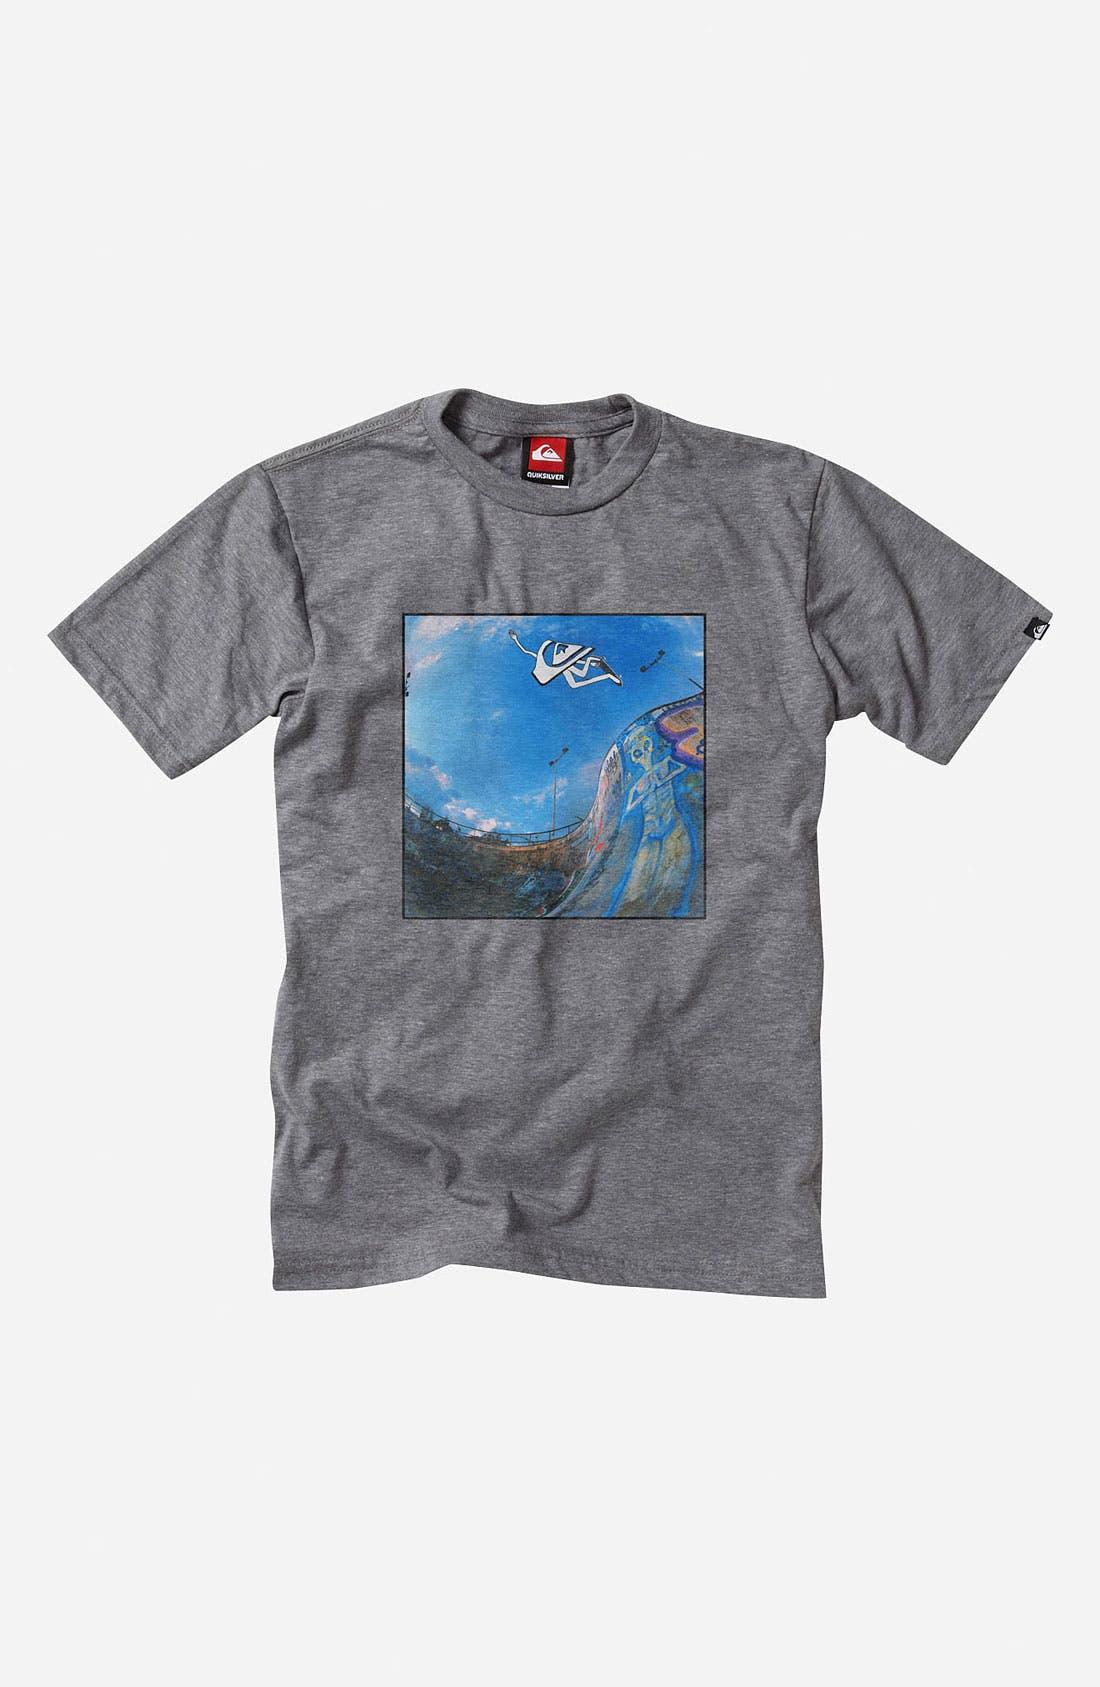 Alternate Image 1 Selected - Quiksilver 'Nomar' Graphic T-Shirt (Big Boys)